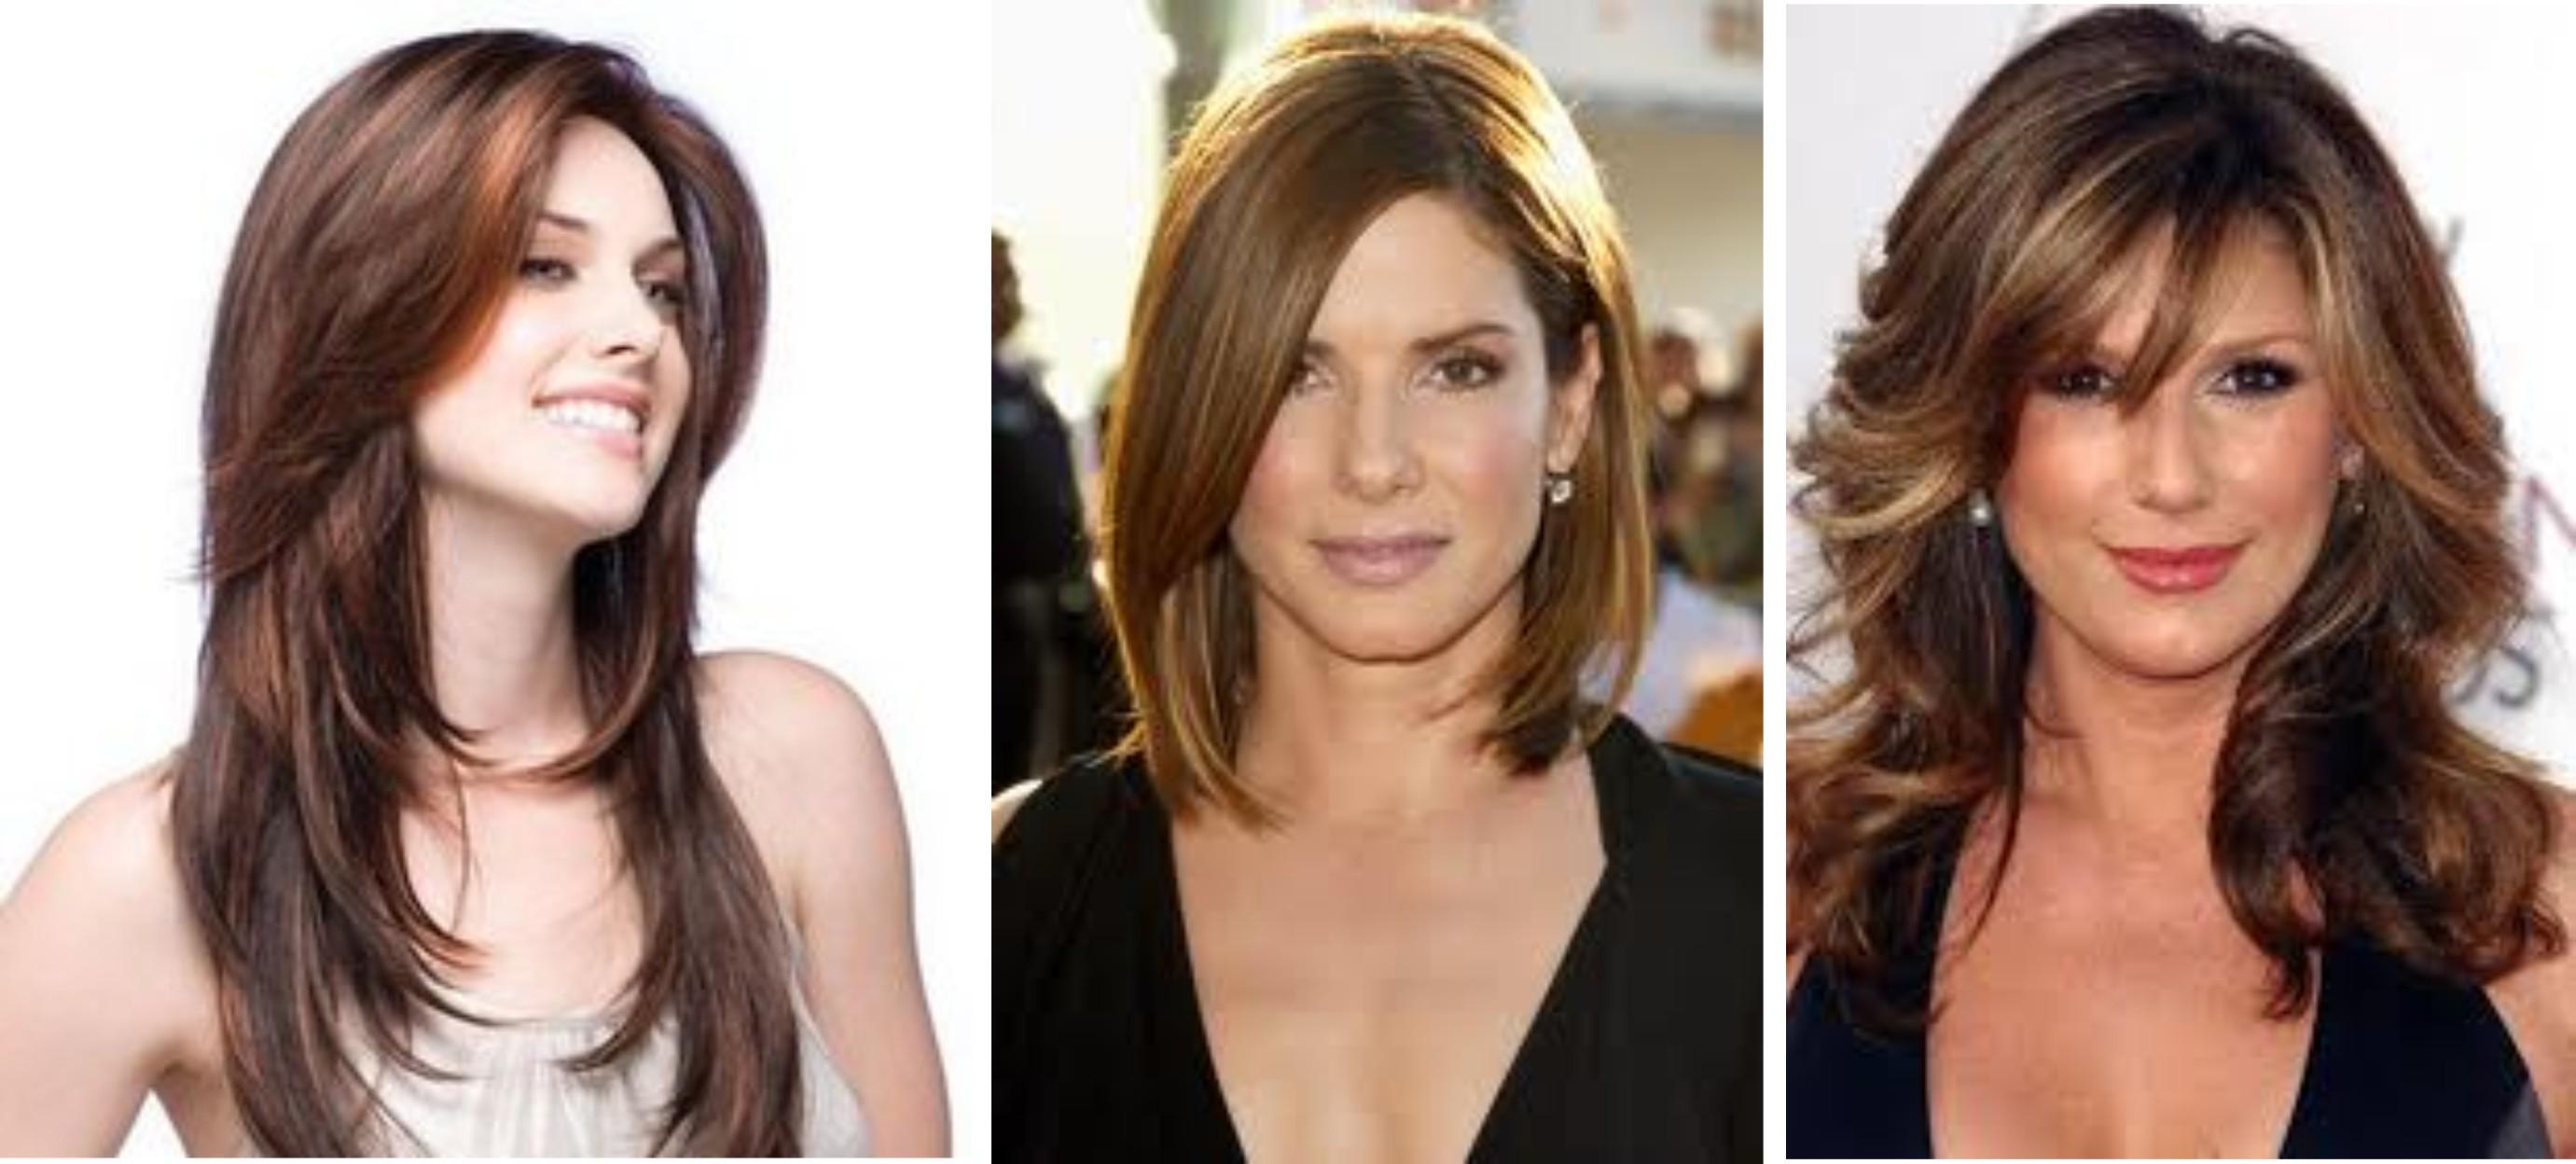 cabello 30 - Como Elegir Tu Corte De Cabello Según Tu Edad